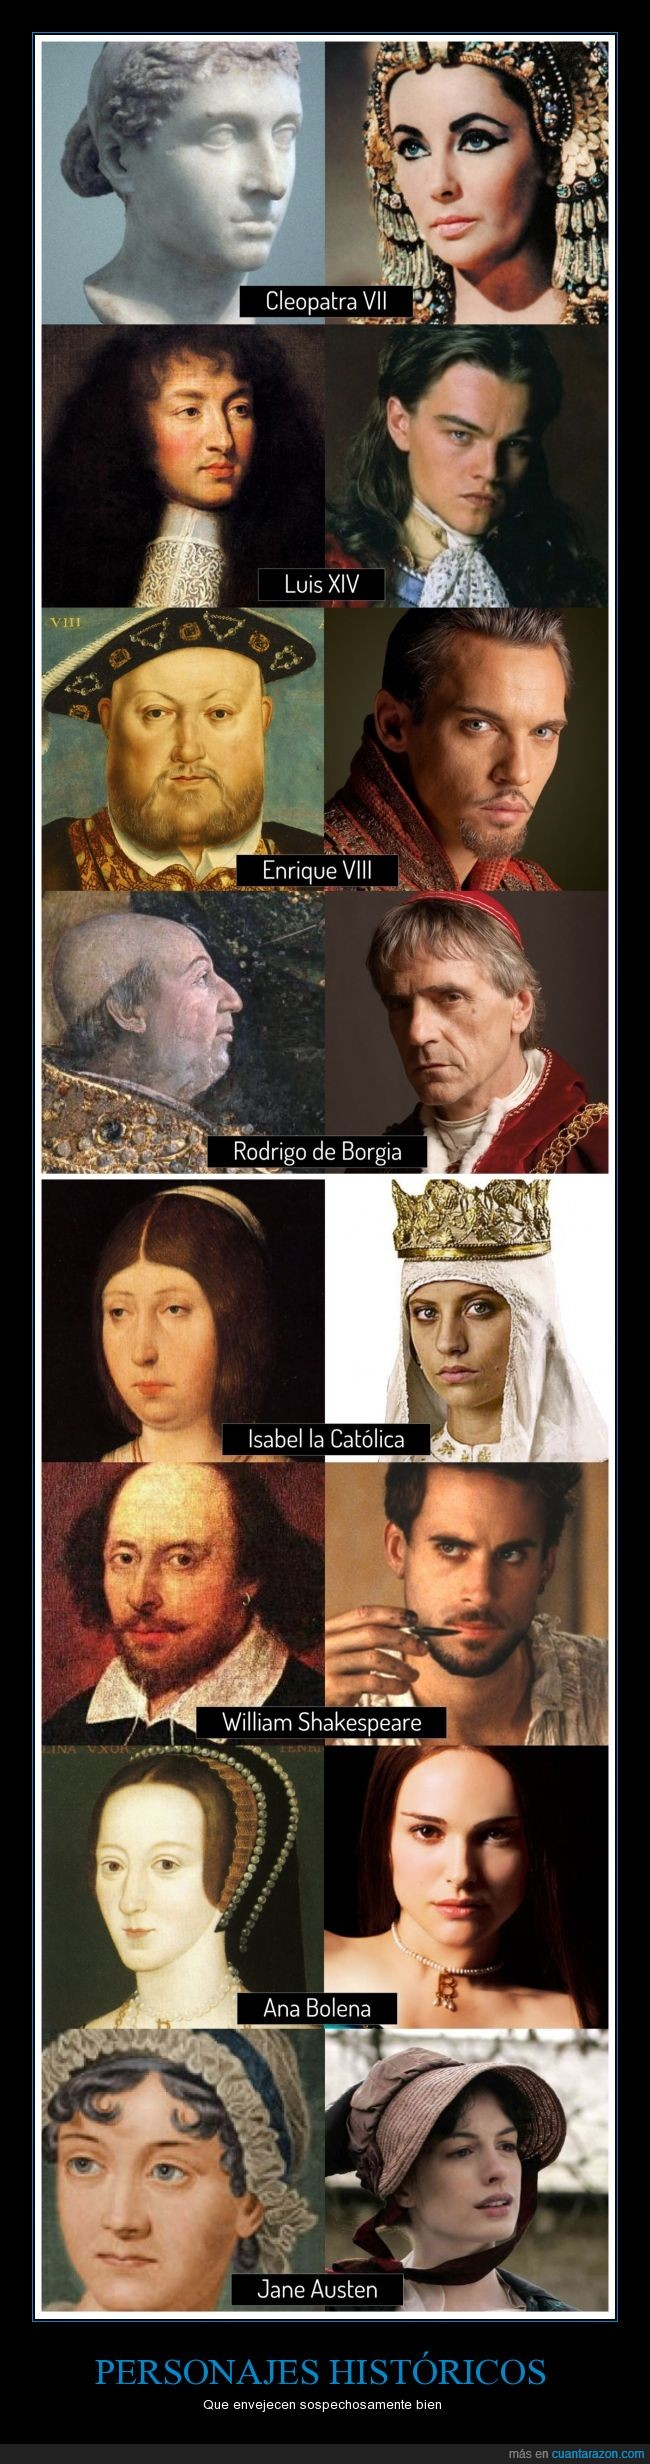 actores,ana bolena,casting,cleopatra,enrique viii,Historia,hollywood,isabel la católica,jane austen,luis xiv,películas